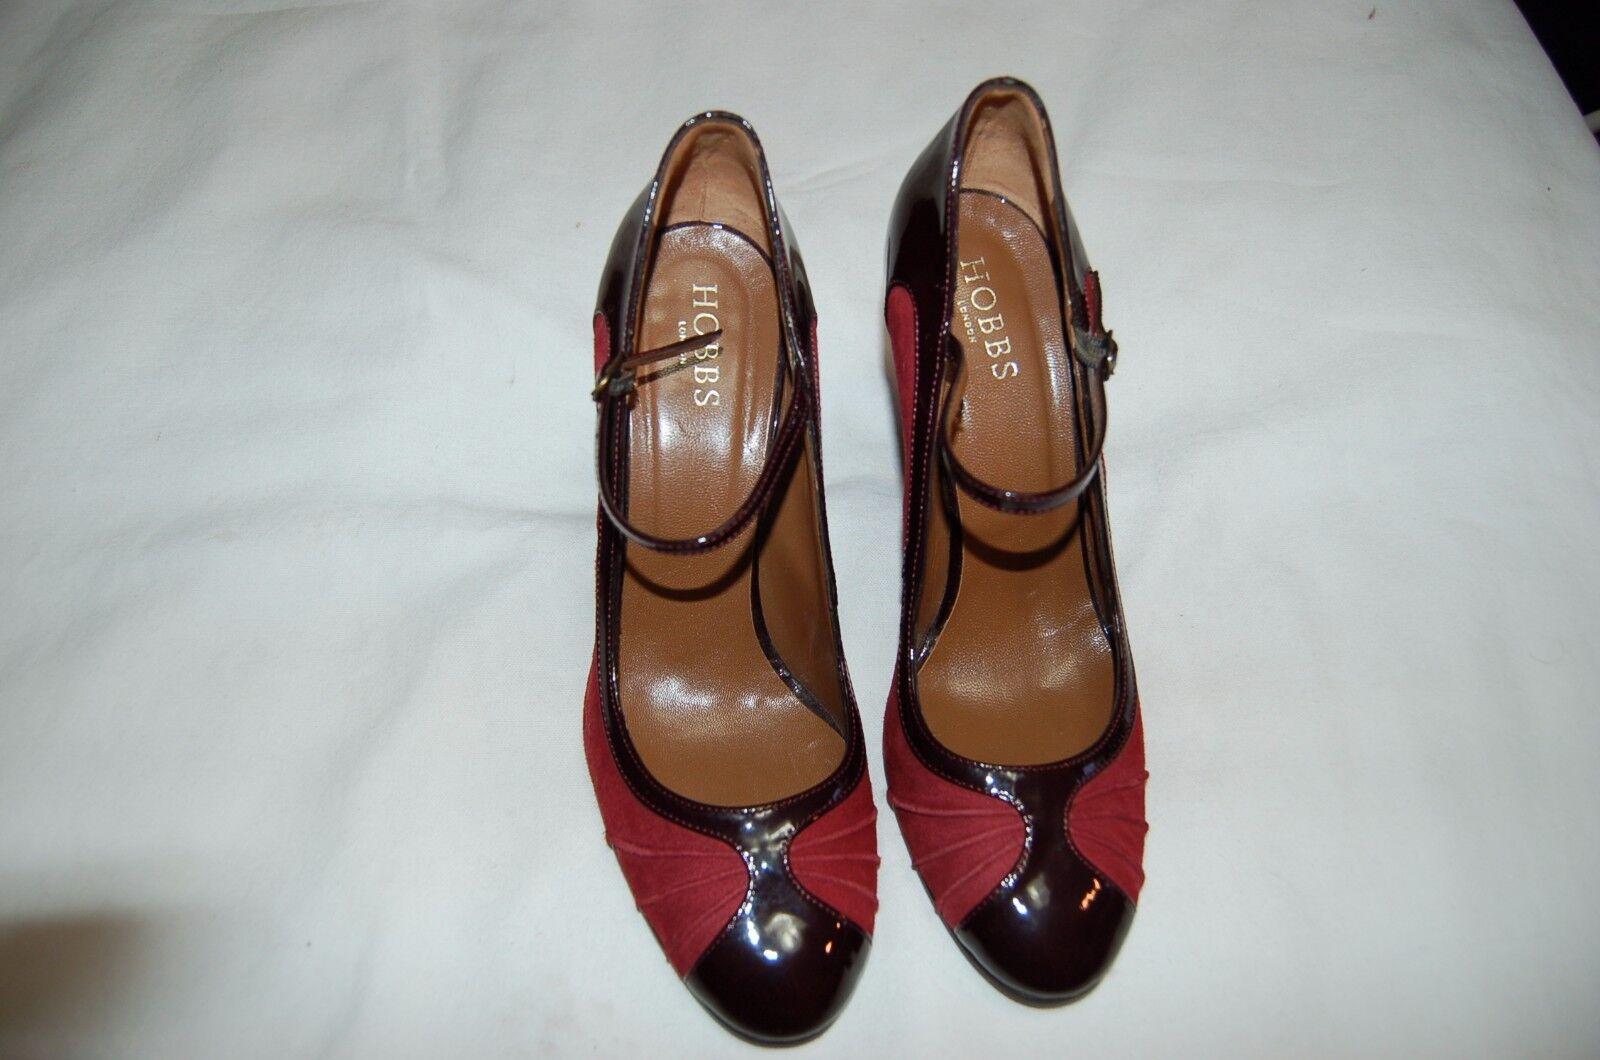 Hobbs Burgundy Suede/Patent Leder Heels Pumps in Schuhes Größe 40 Made in Pumps  ab2c0b